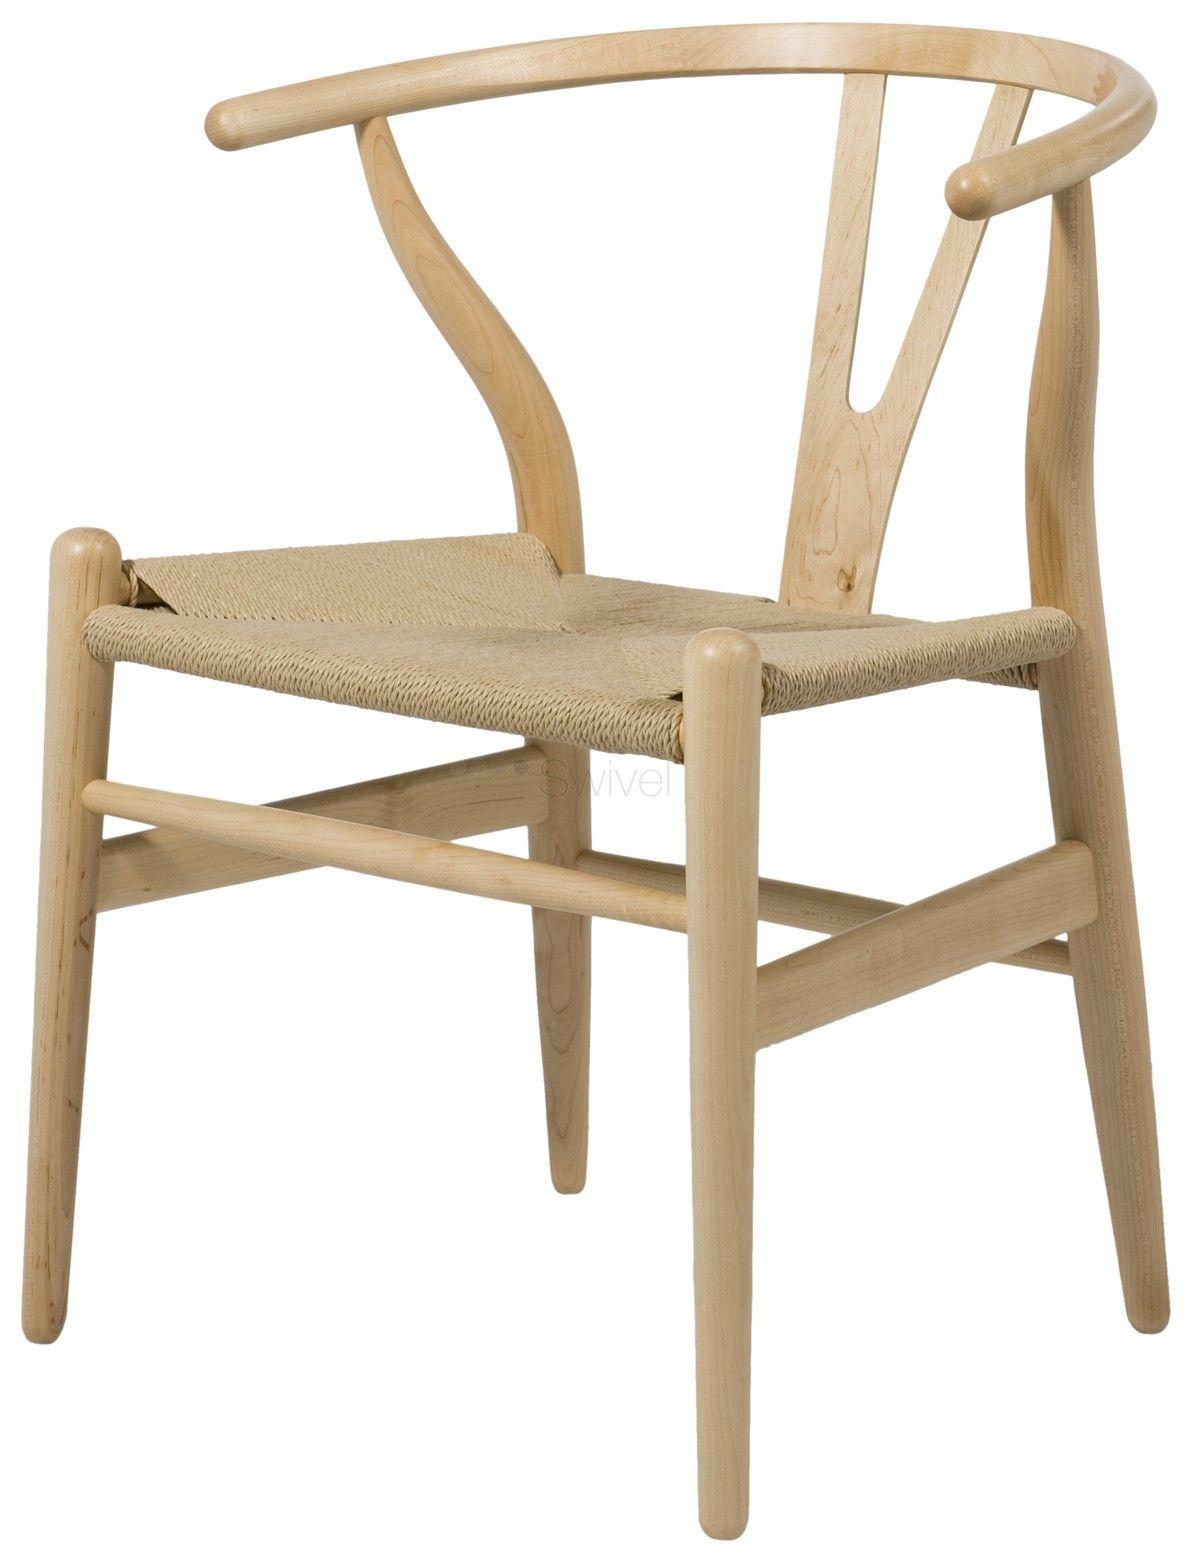 Marvelous Hans Wegner Wishbone Chair   Google Search